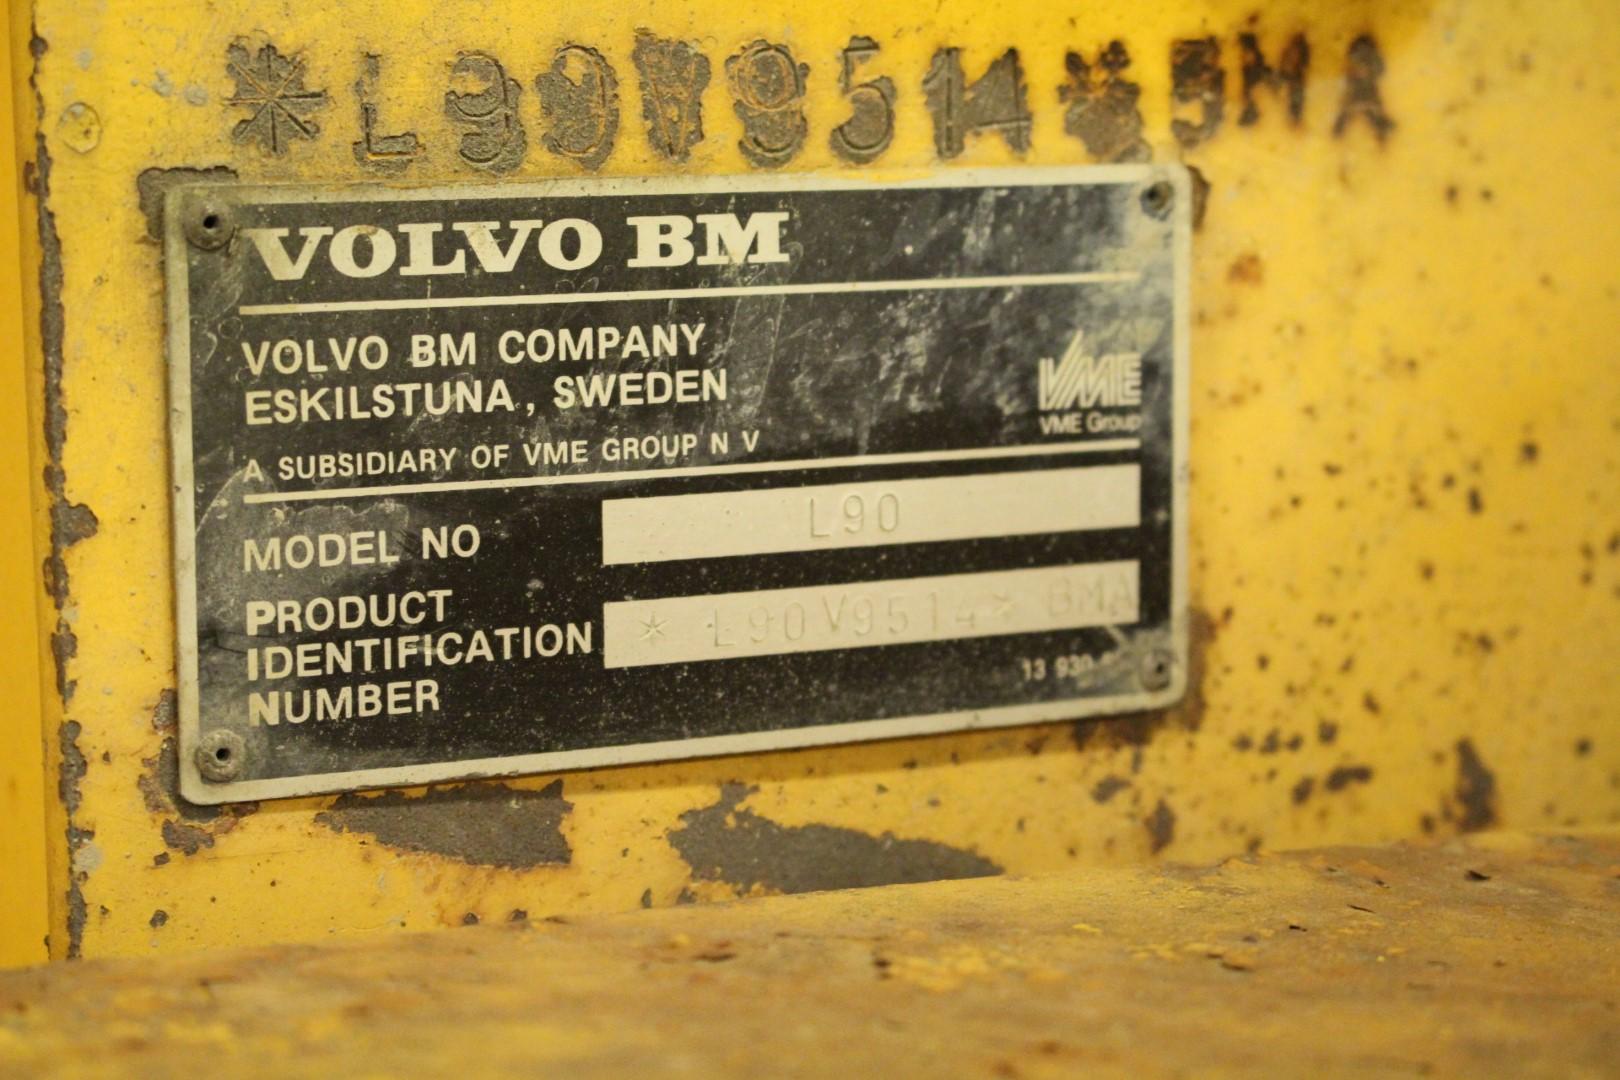 Hjullastare Volvo Bm L90 17253h Ps Auction We Value The